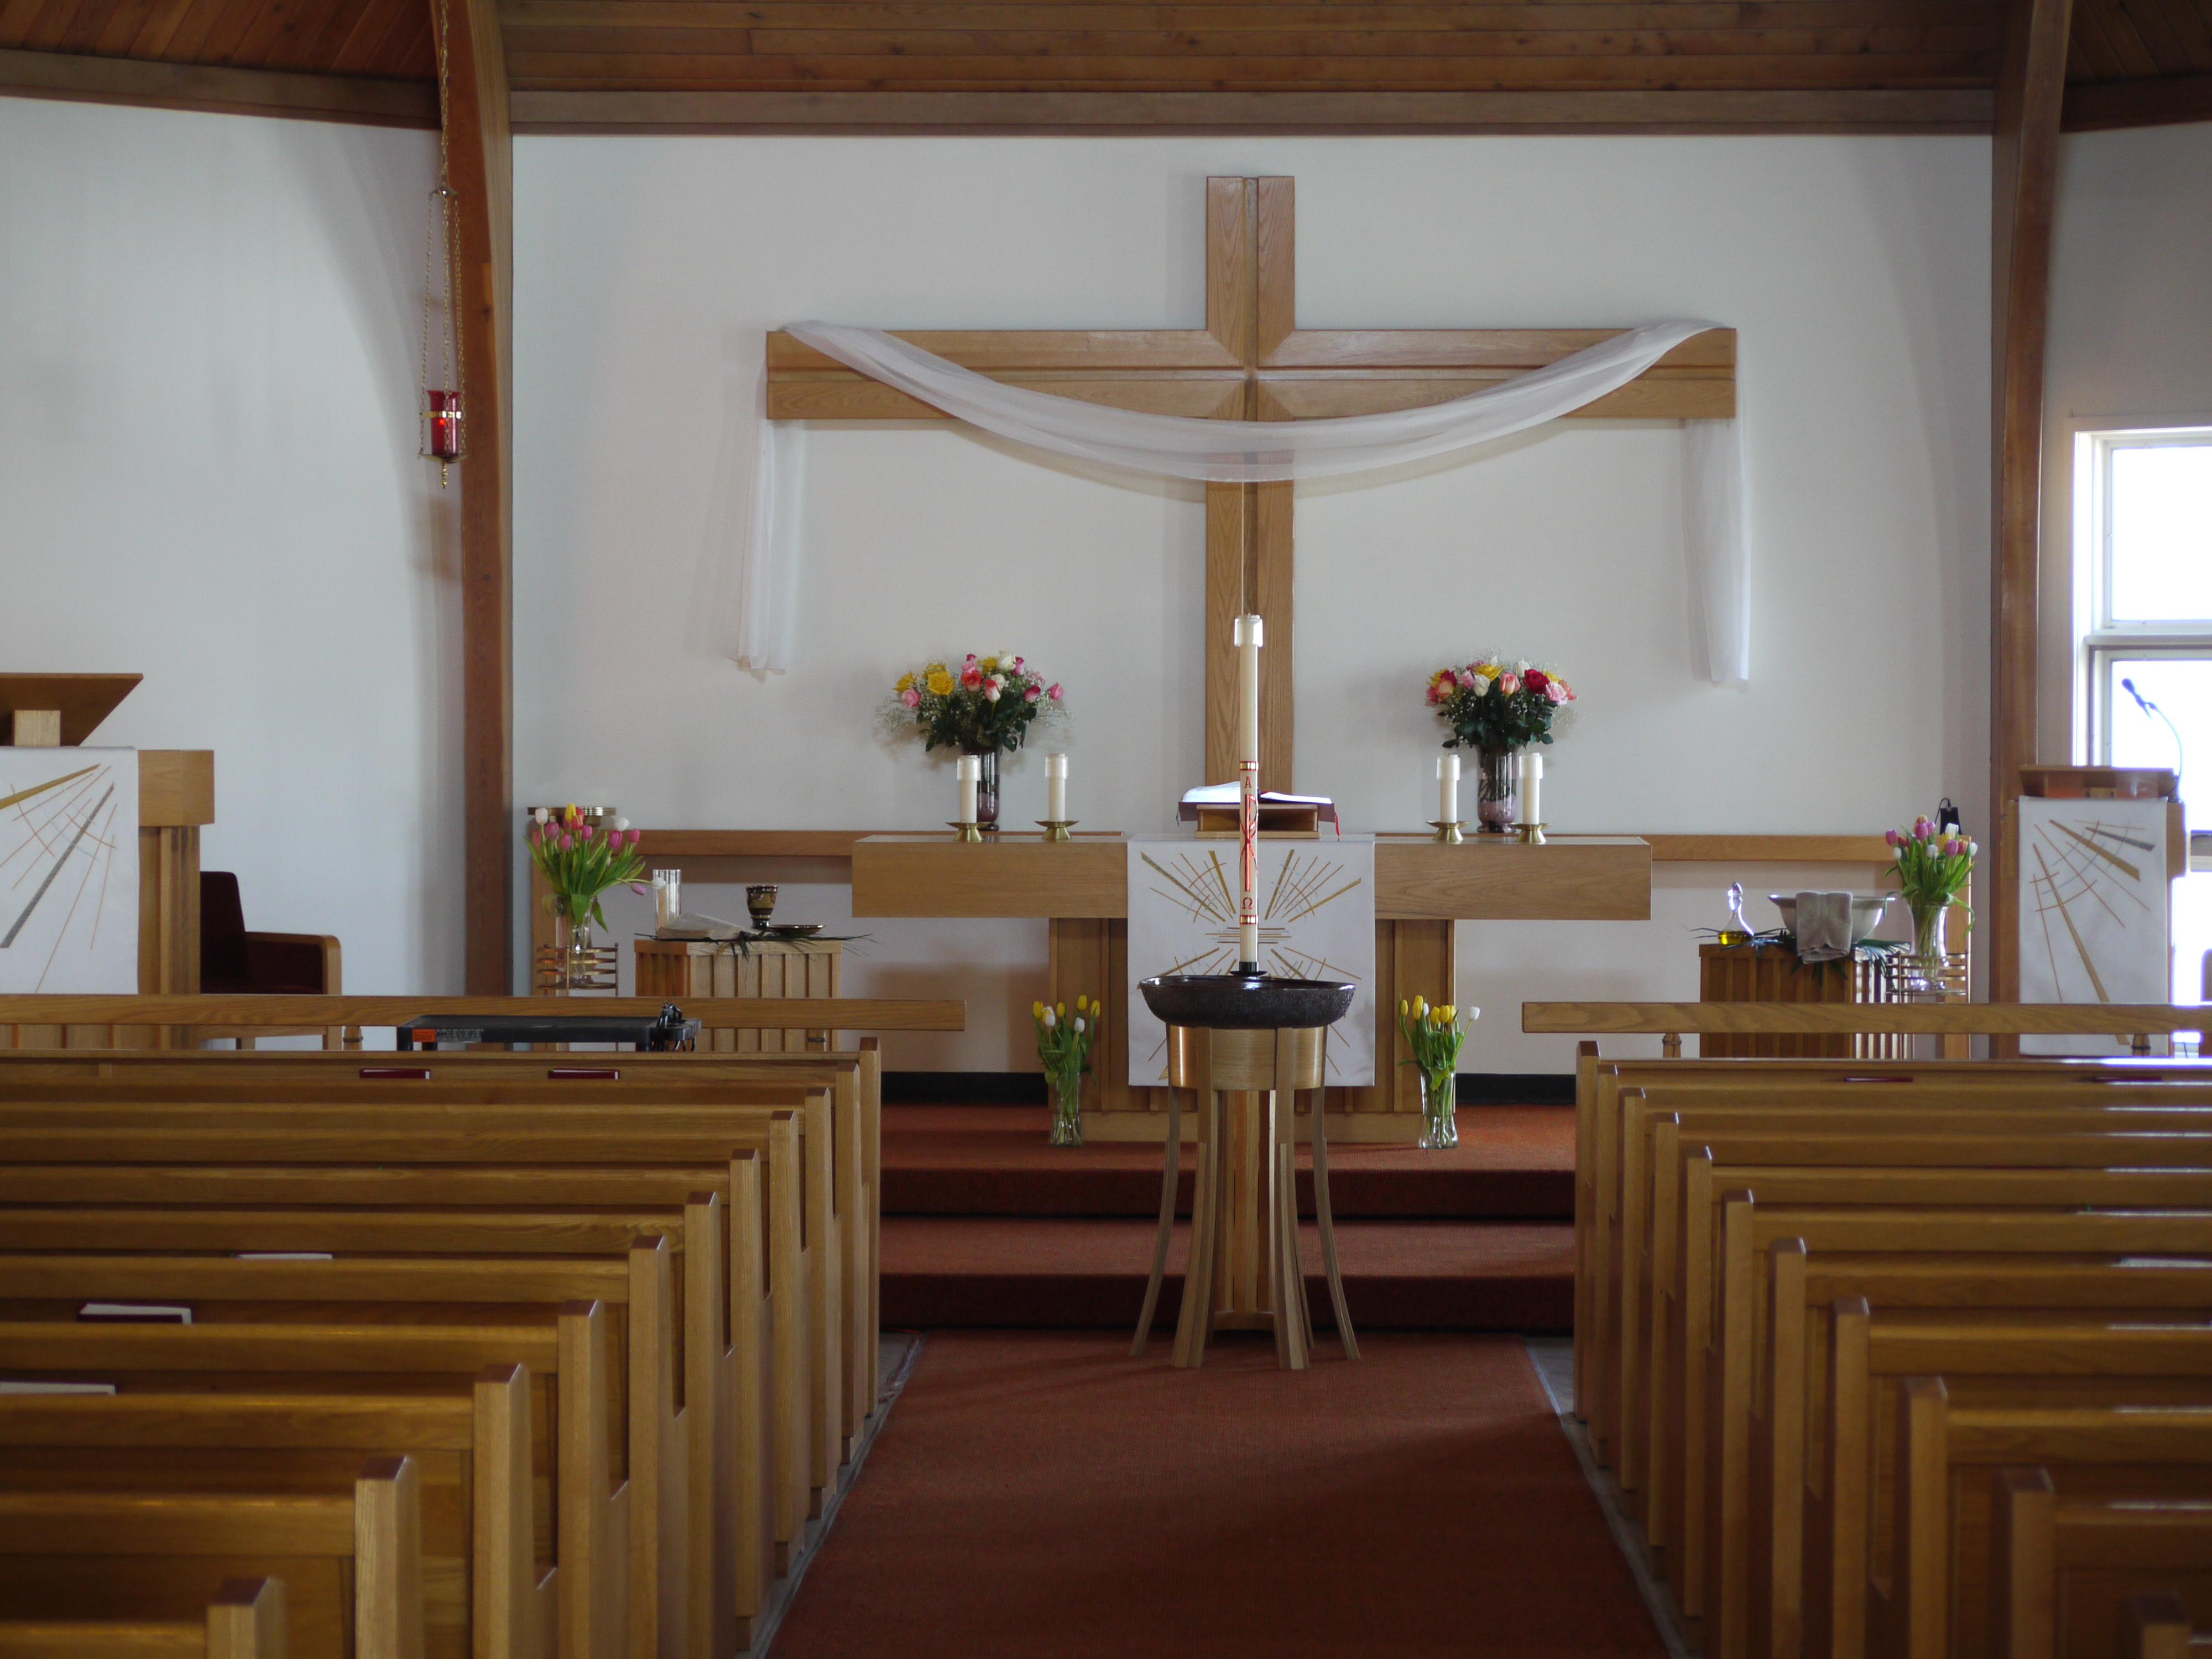 Our Savior's is a beautiful church!